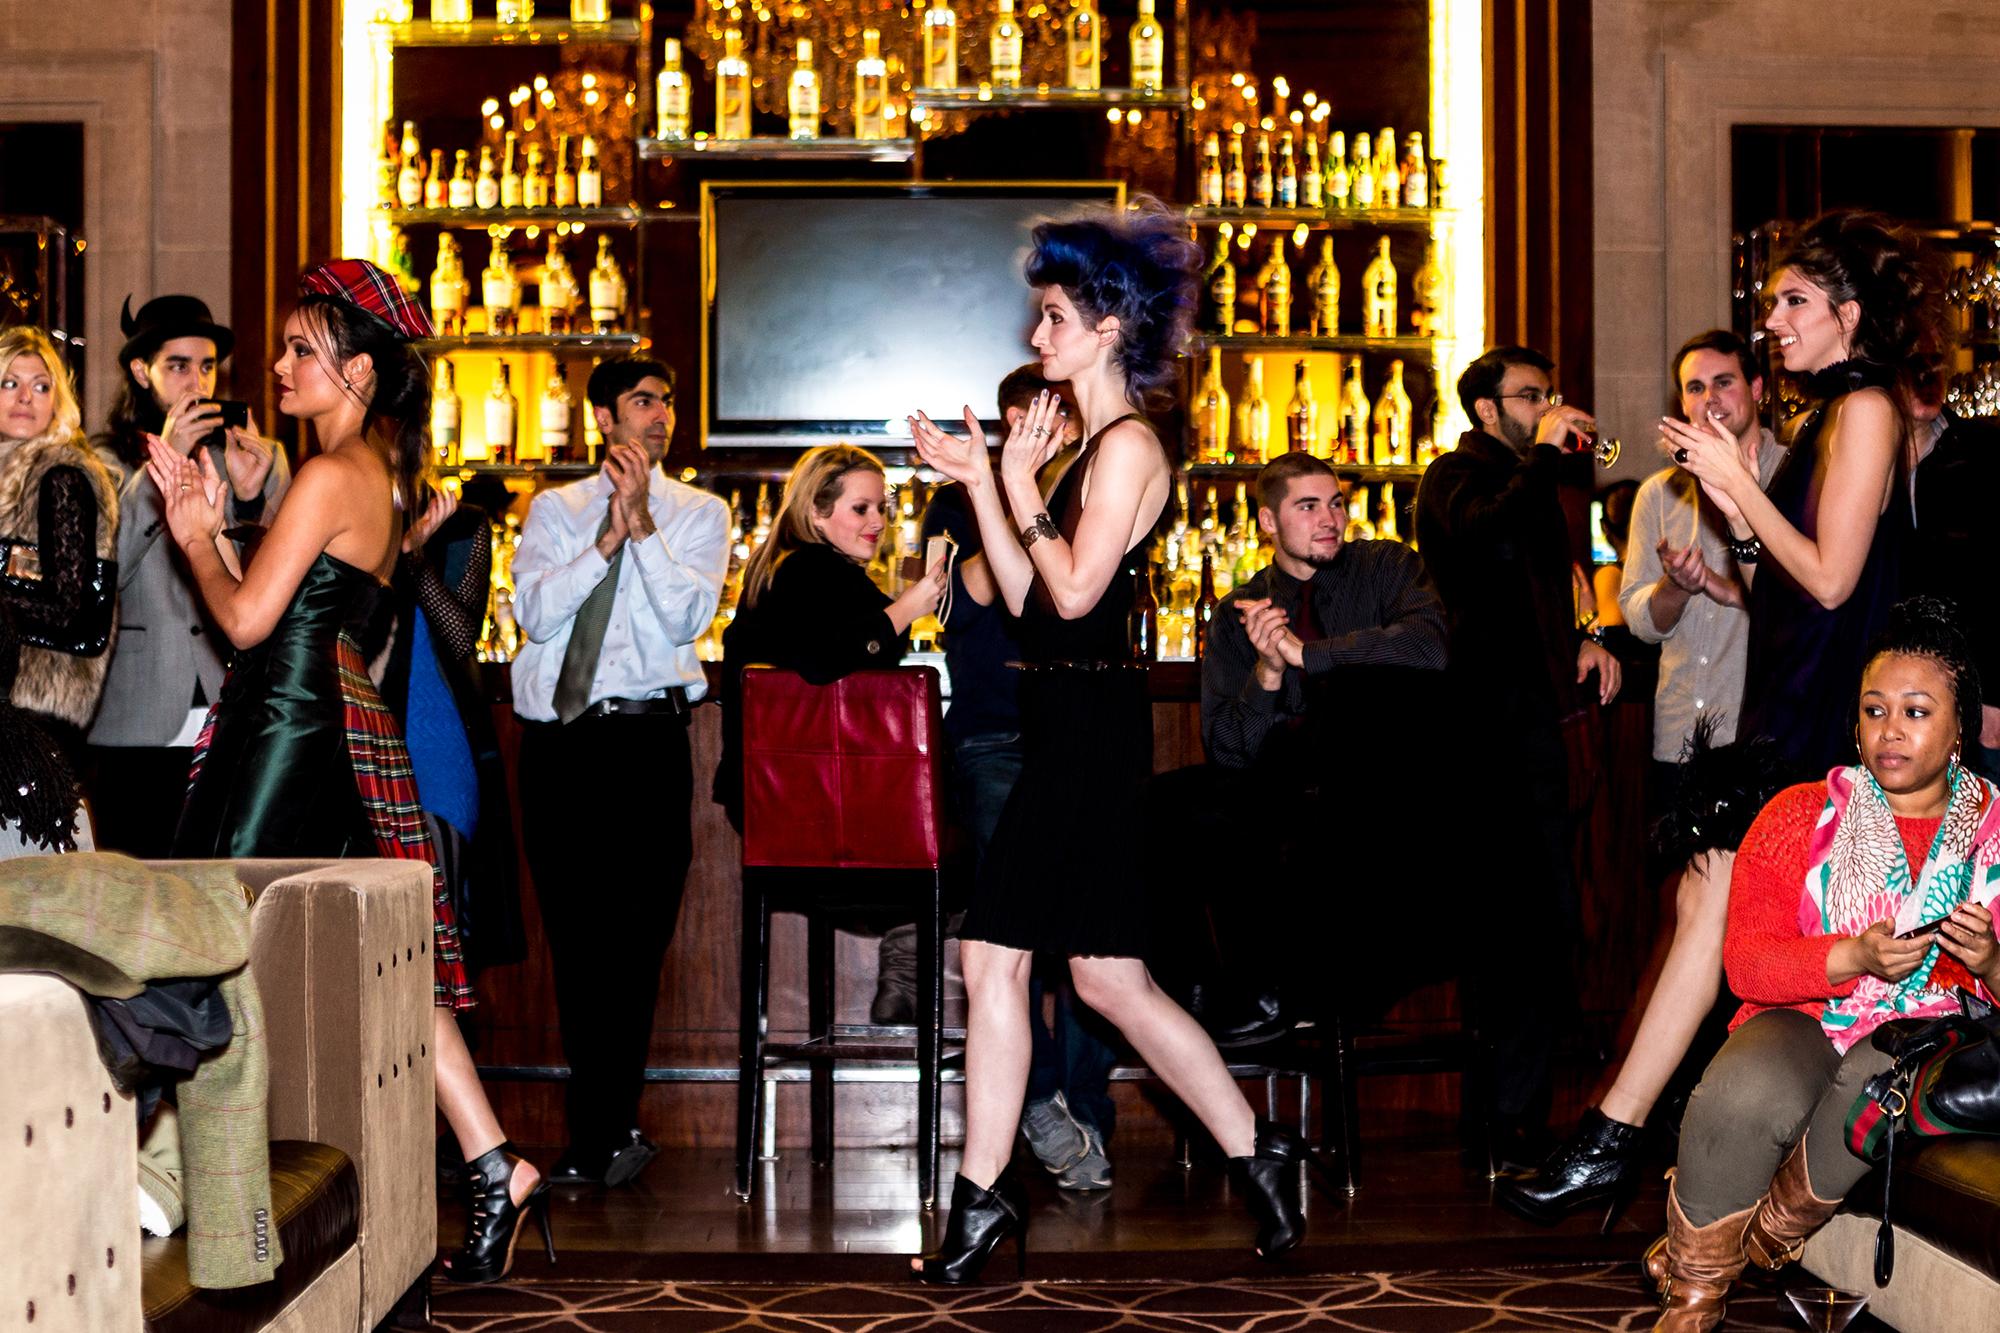 Models Renee Gadsden, Geena Matuson (@geenamatuson) and Renée Ricciardi wear Chynna Pope at fashion show. Image by CDA Media.